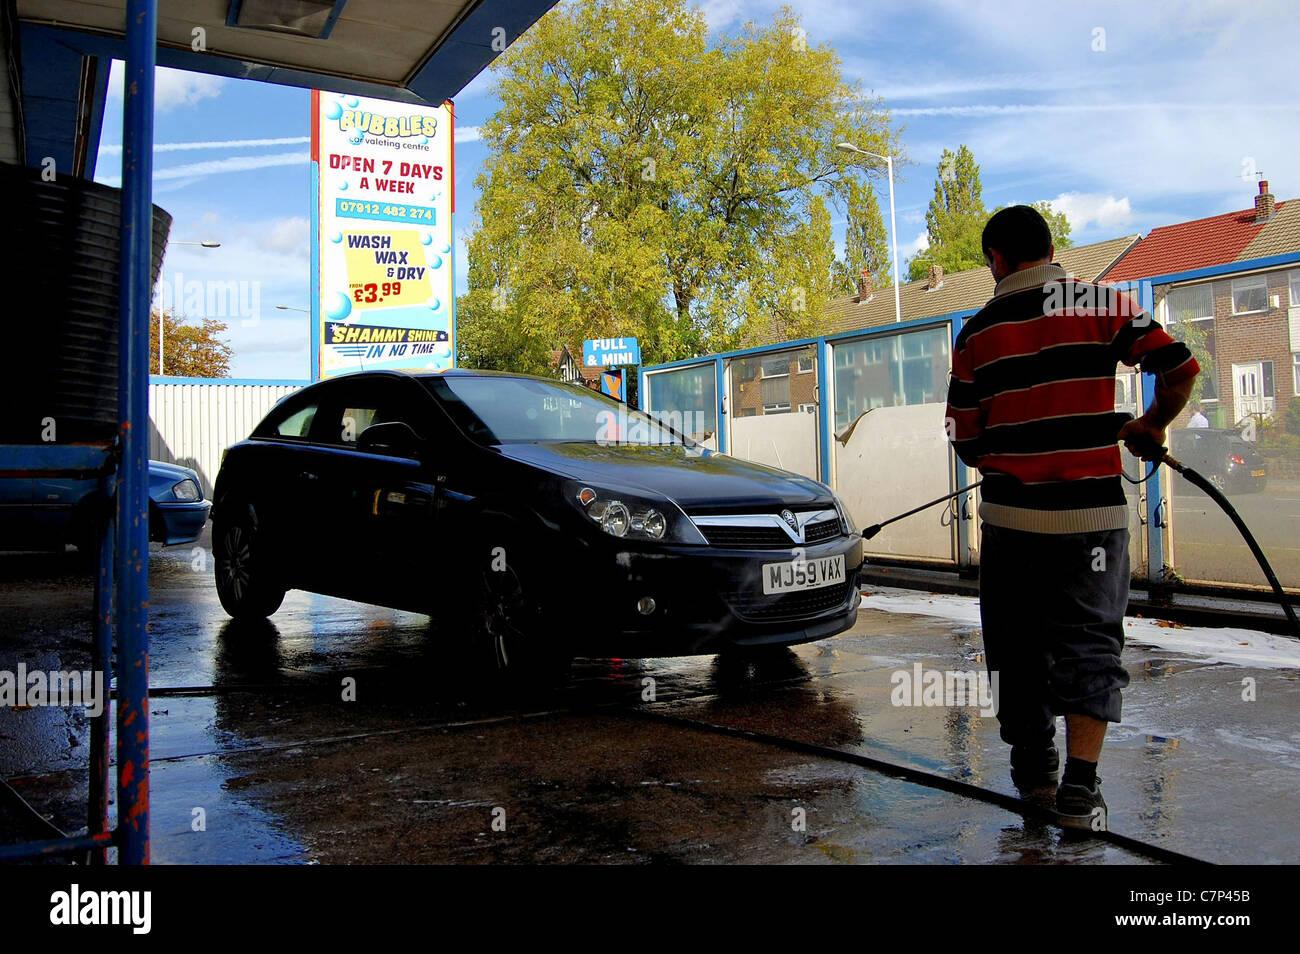 Car being sprayed at jet wash - Stock Image